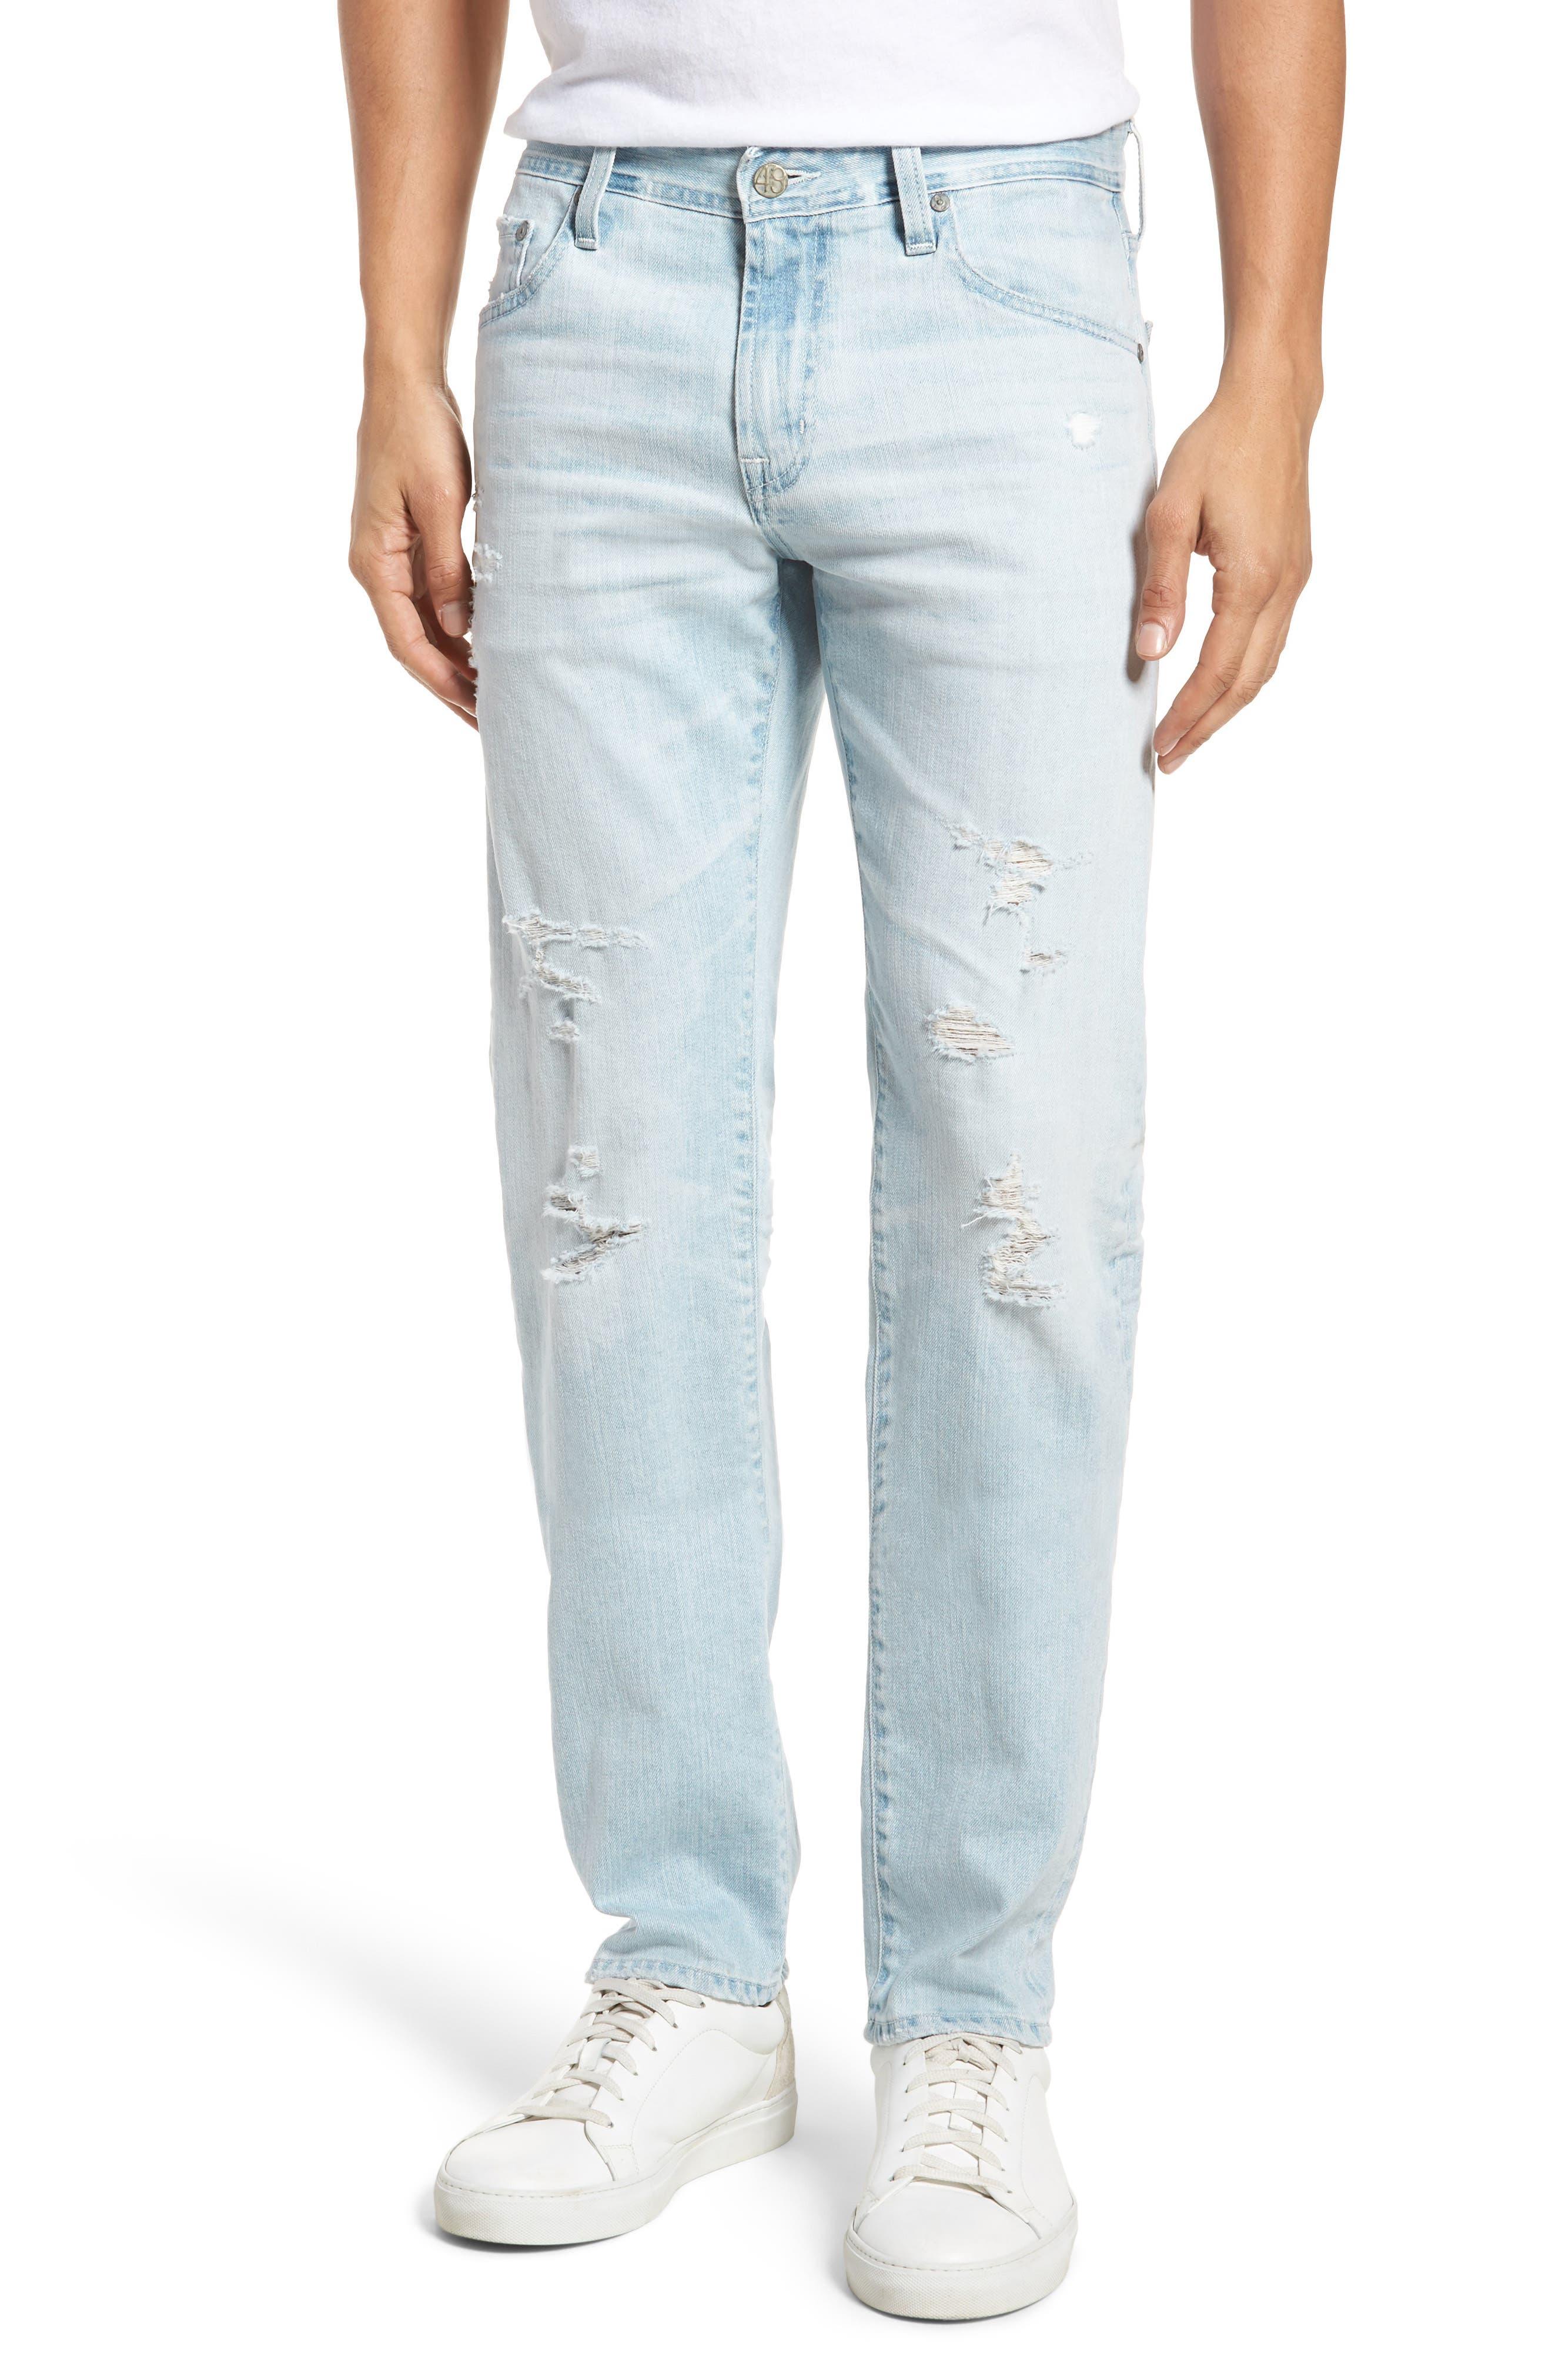 Tellis Slim Fit Jeans,                         Main,                         color, 27 Years Surfrider